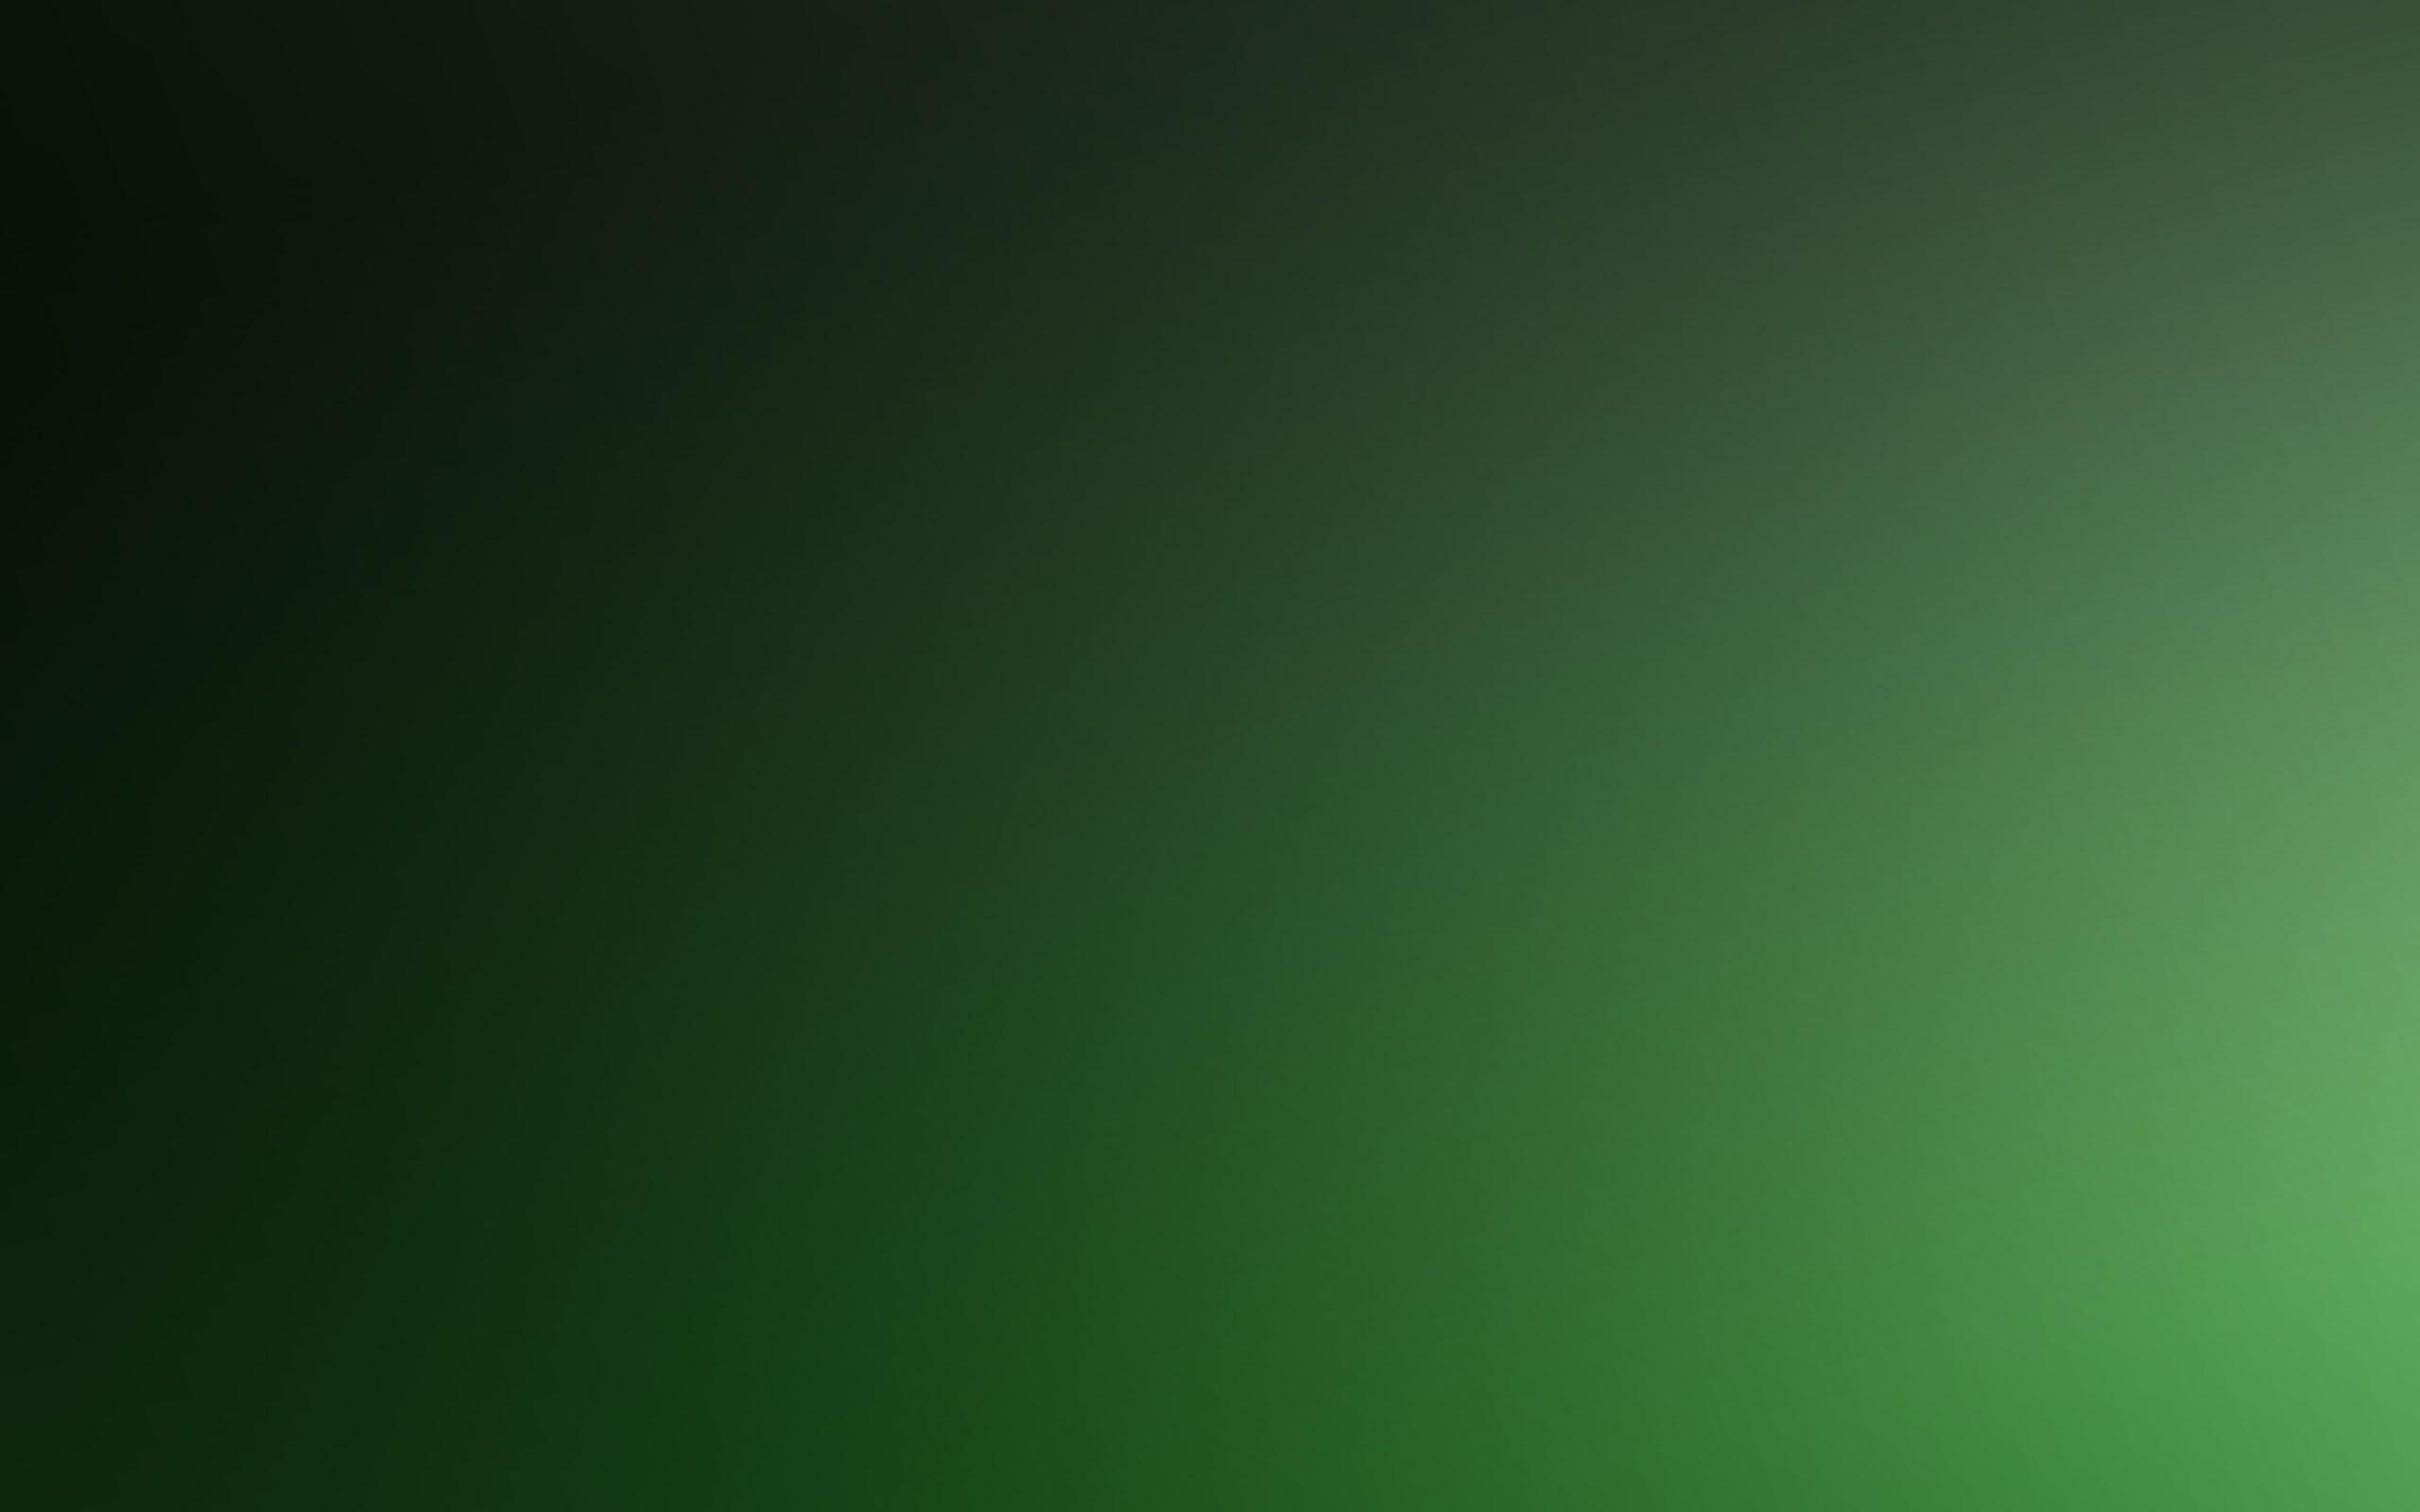 HD Background Dark Green Color Gradient Solid Bright Light .